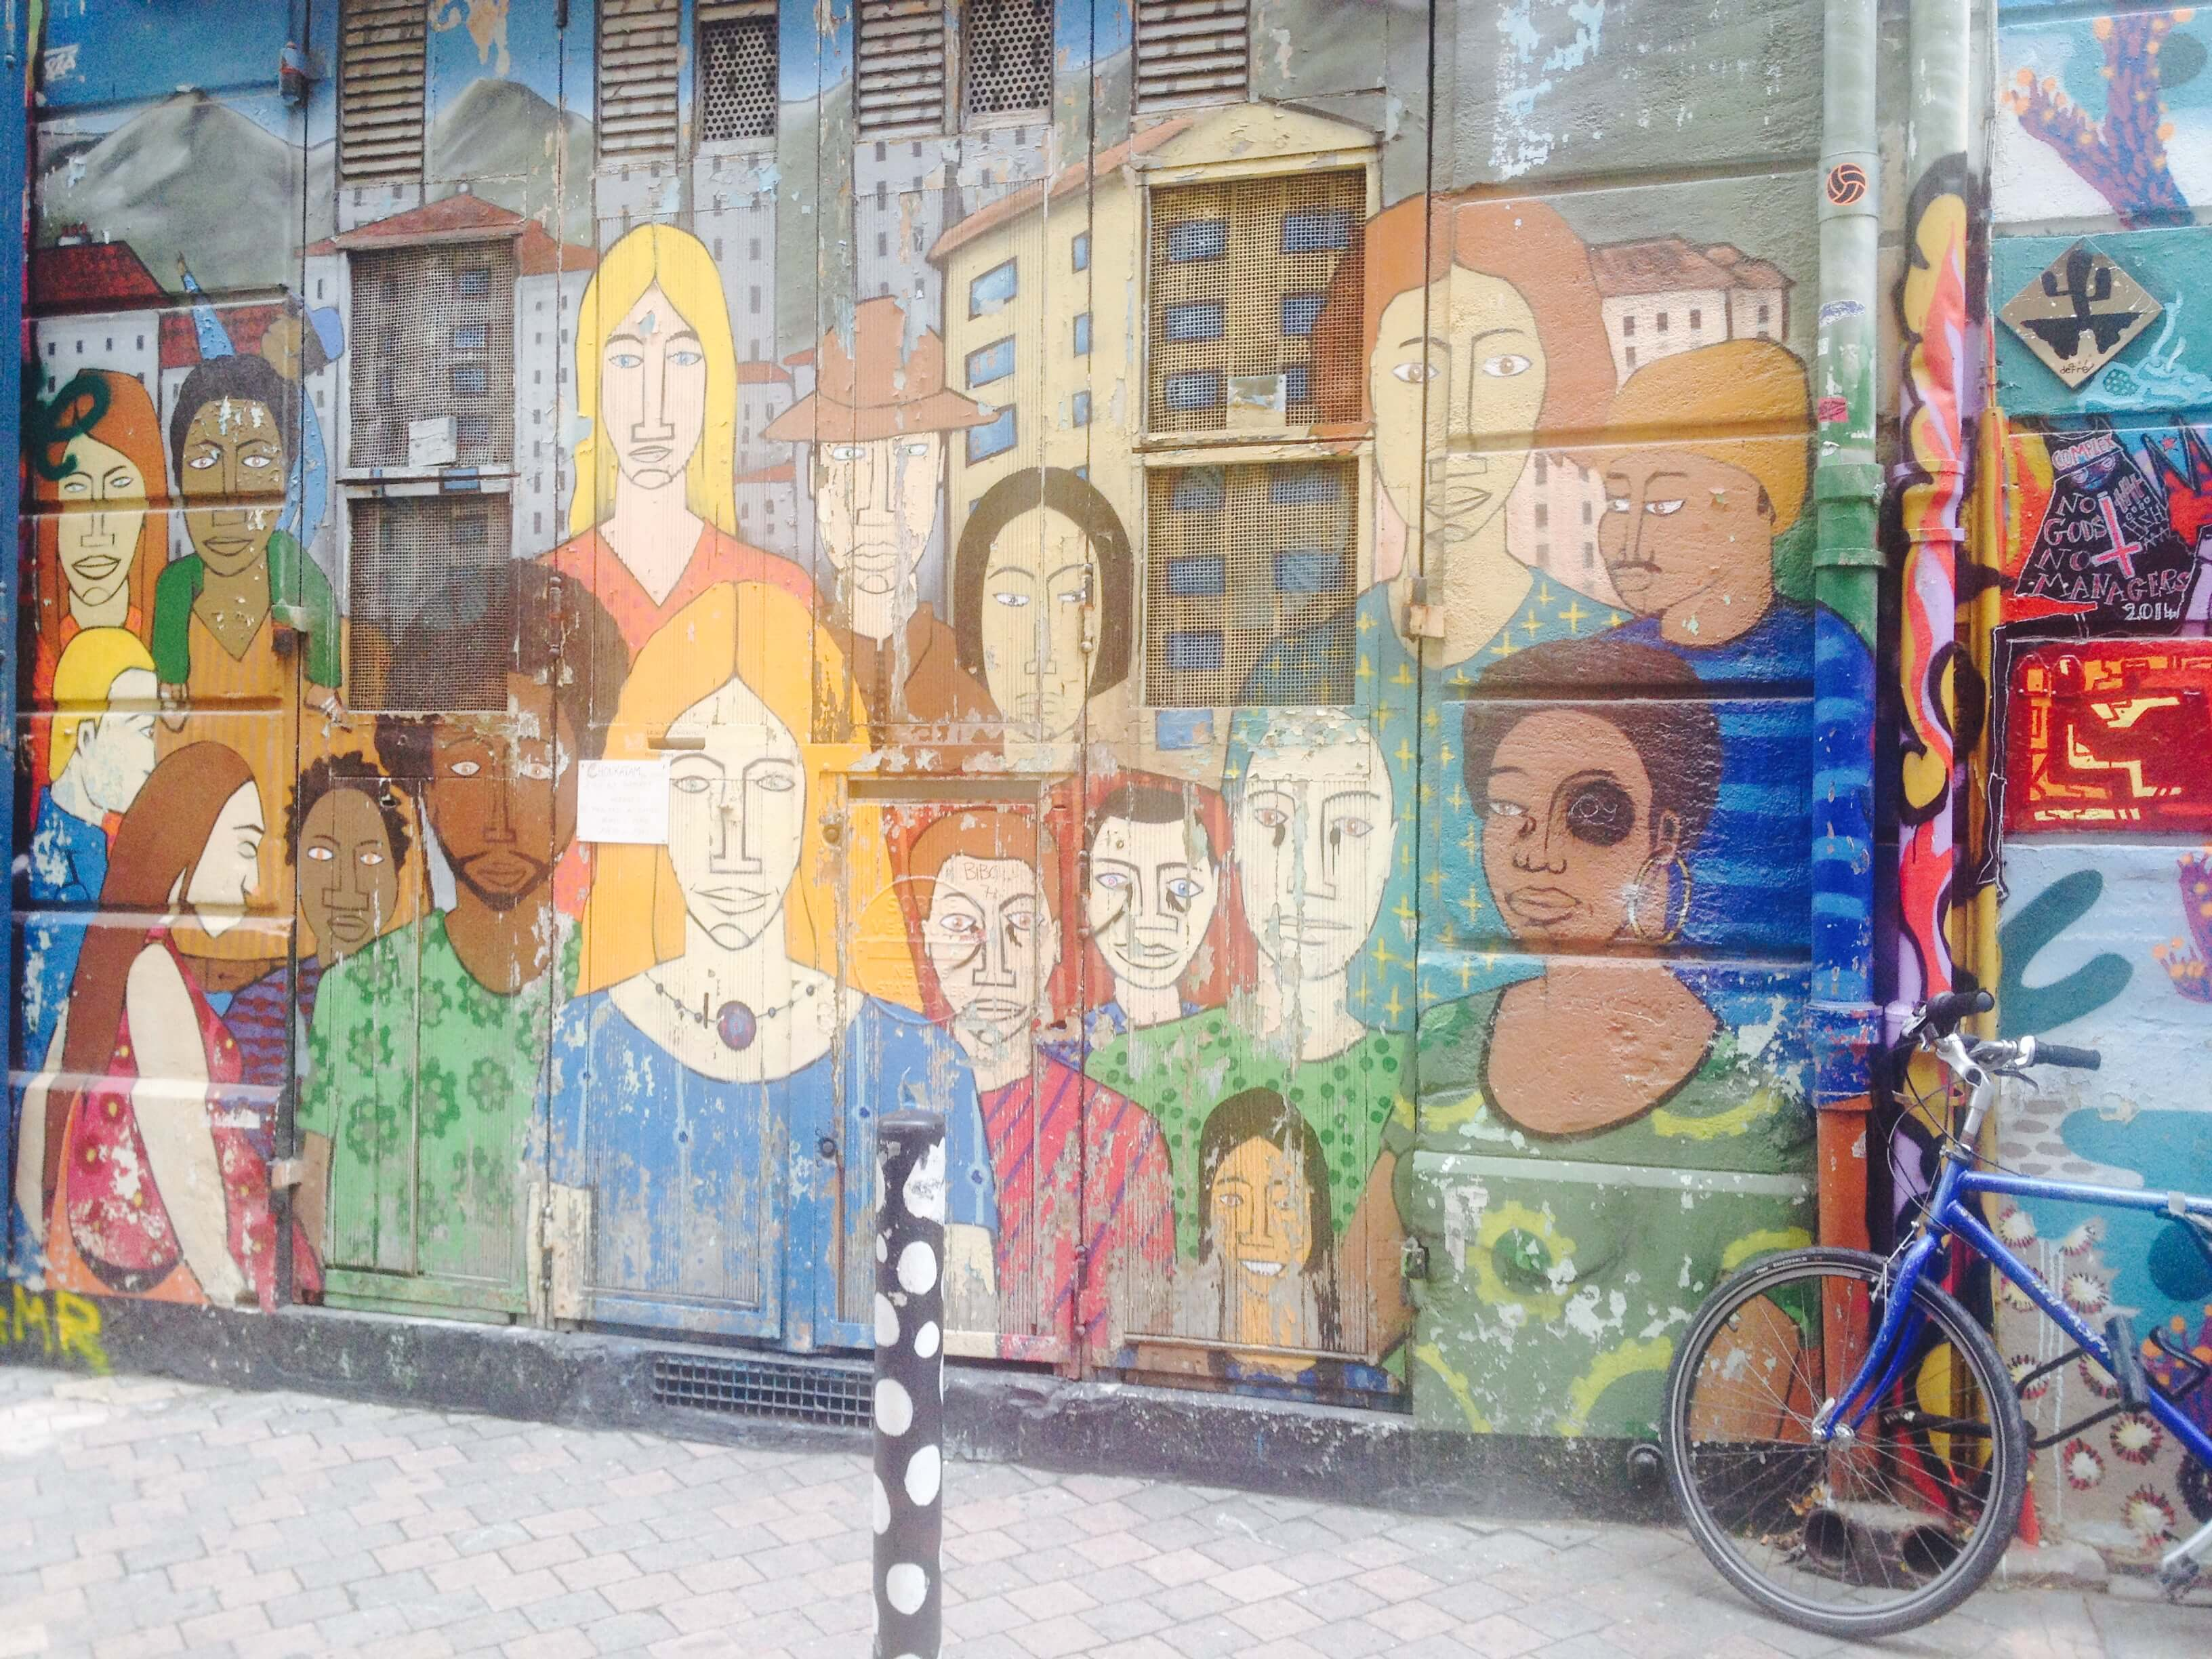 Street art in Cours Julien, Marseille.